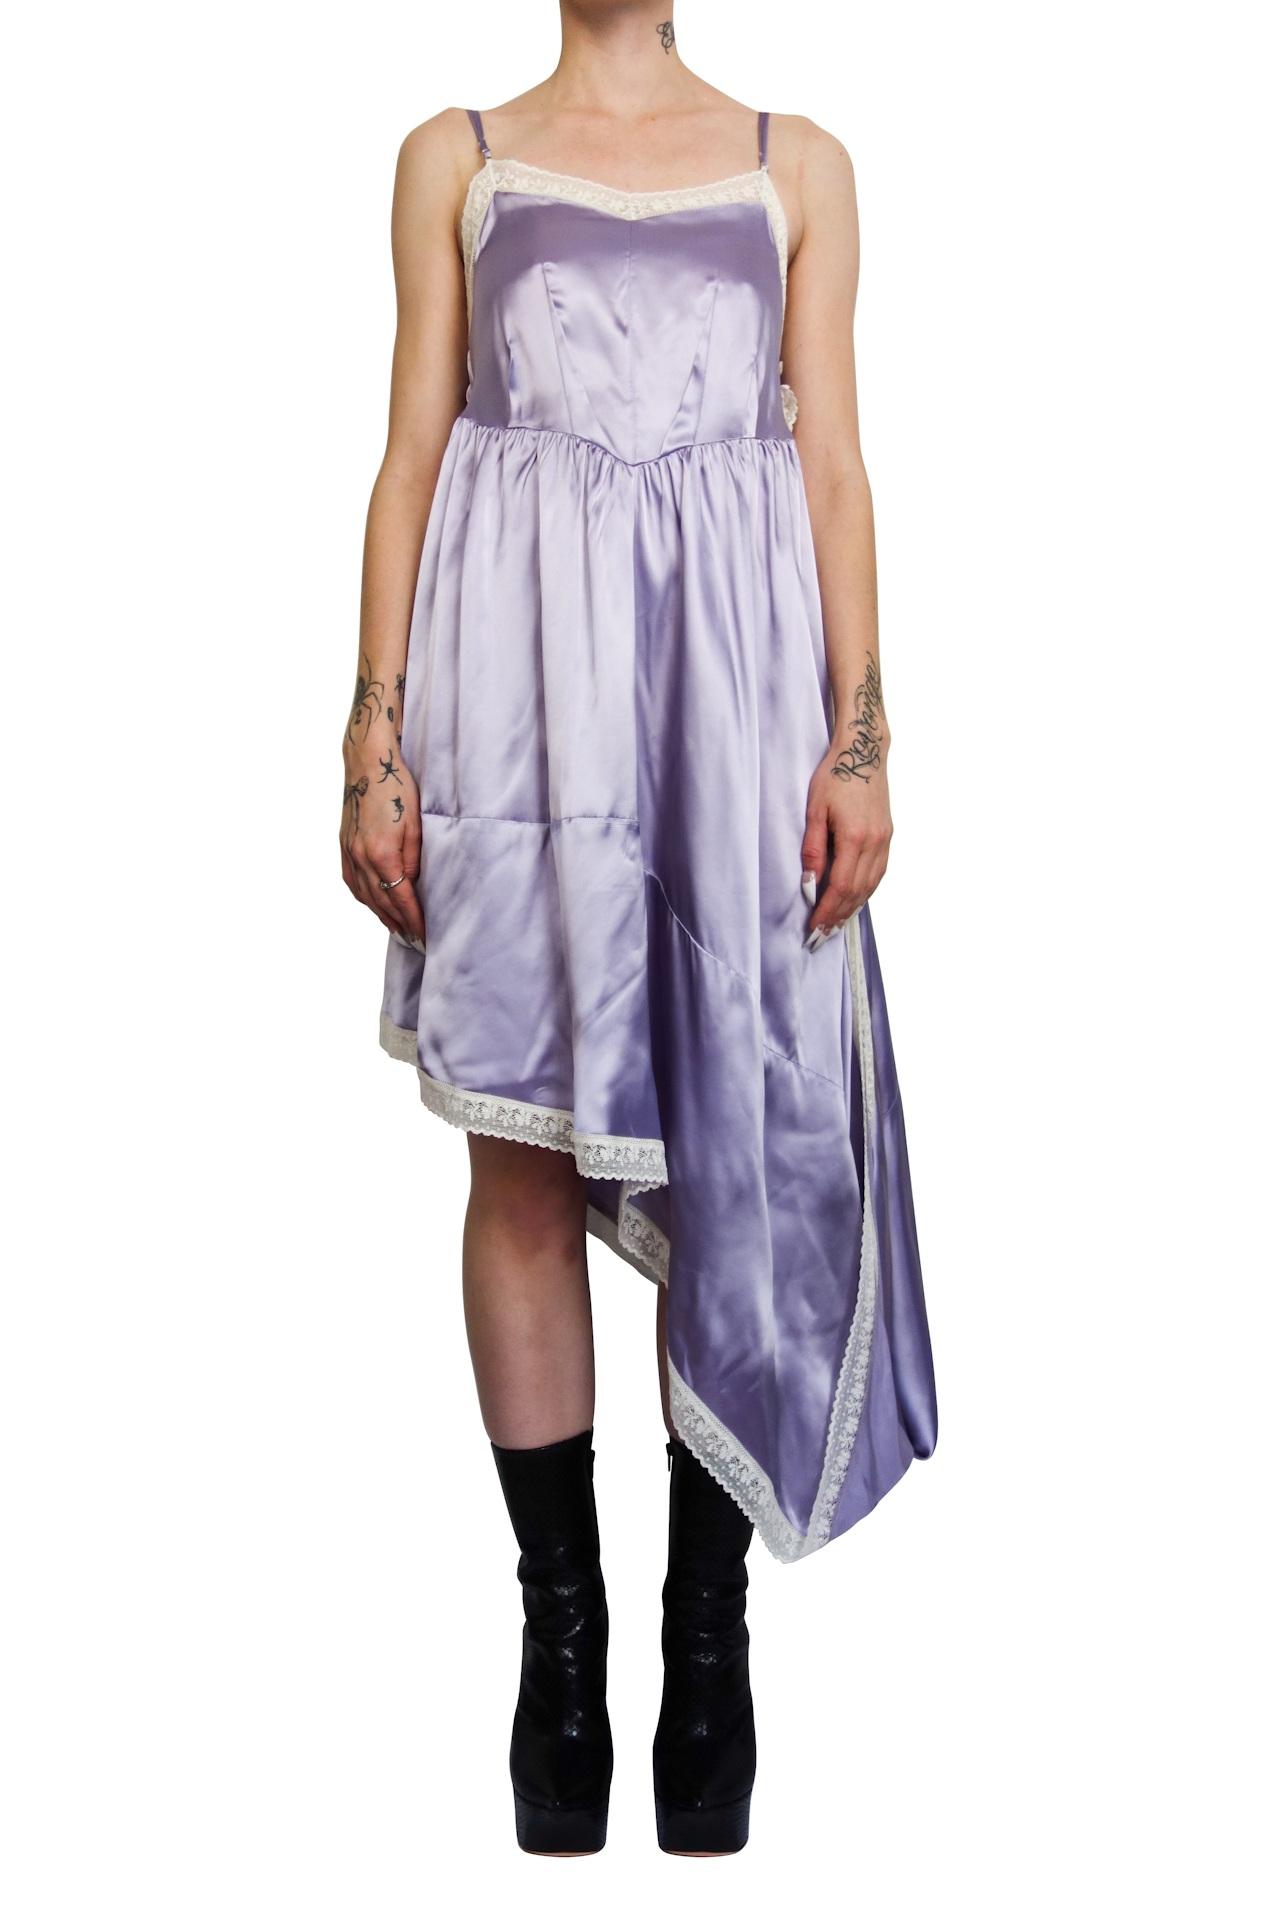 MM6 Maison Margiela Lilac Slip Dress $879 -